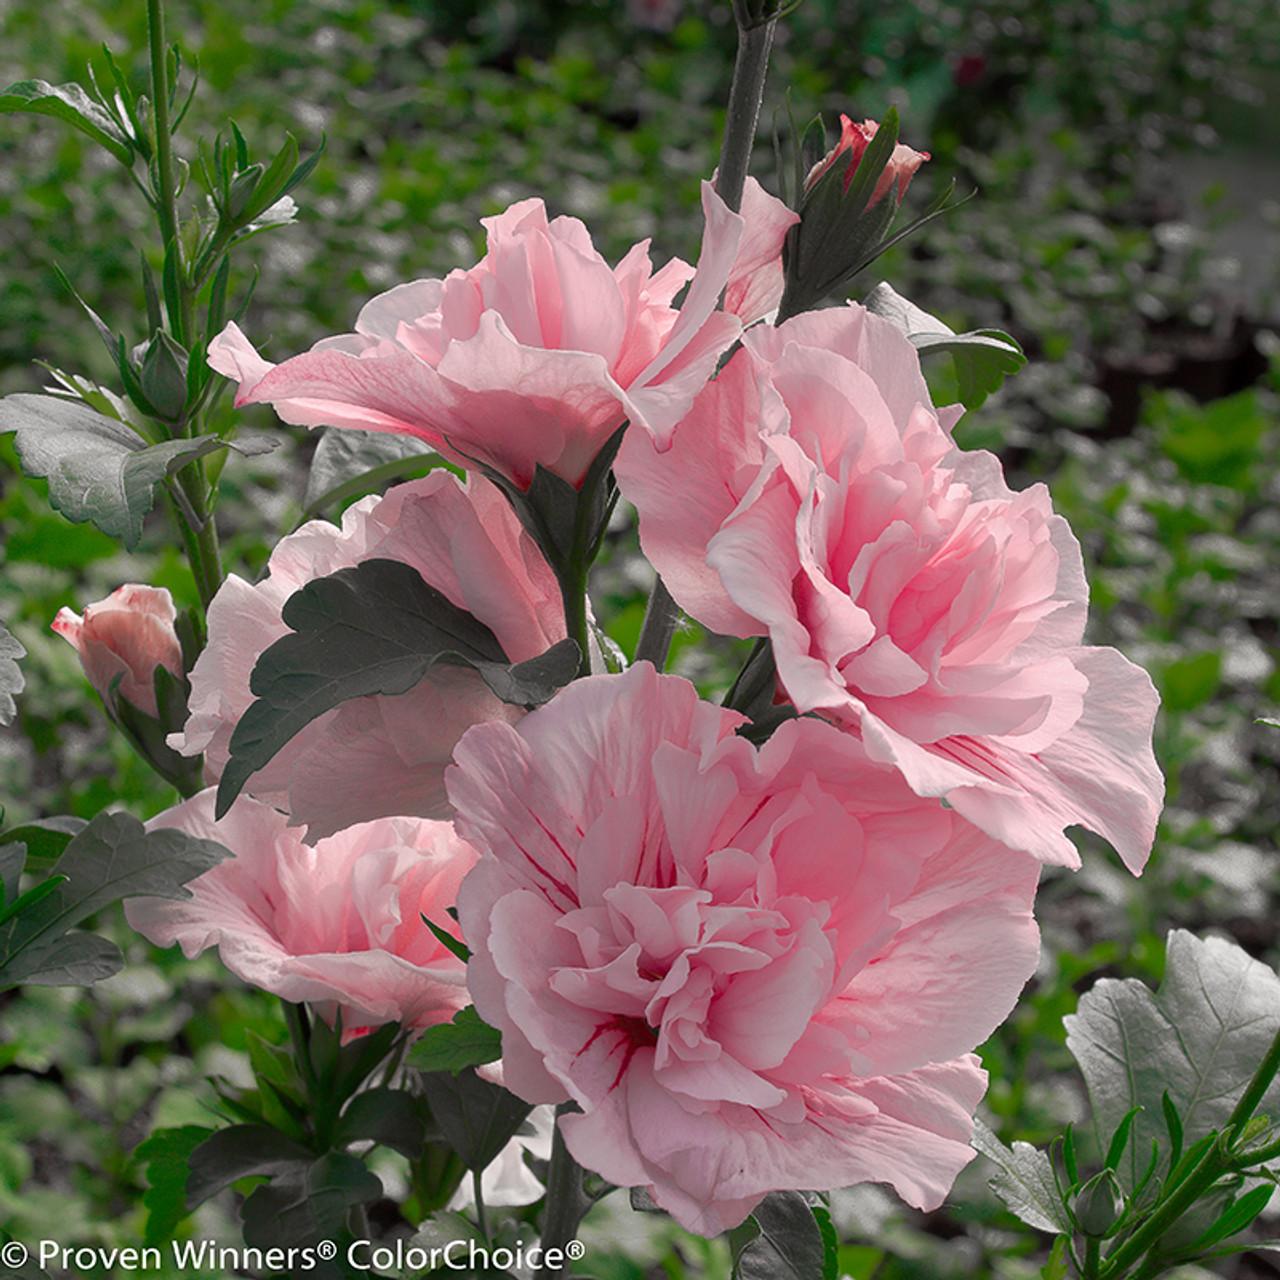 Pink Chiffon Rose Of Sharon Plant Addicts